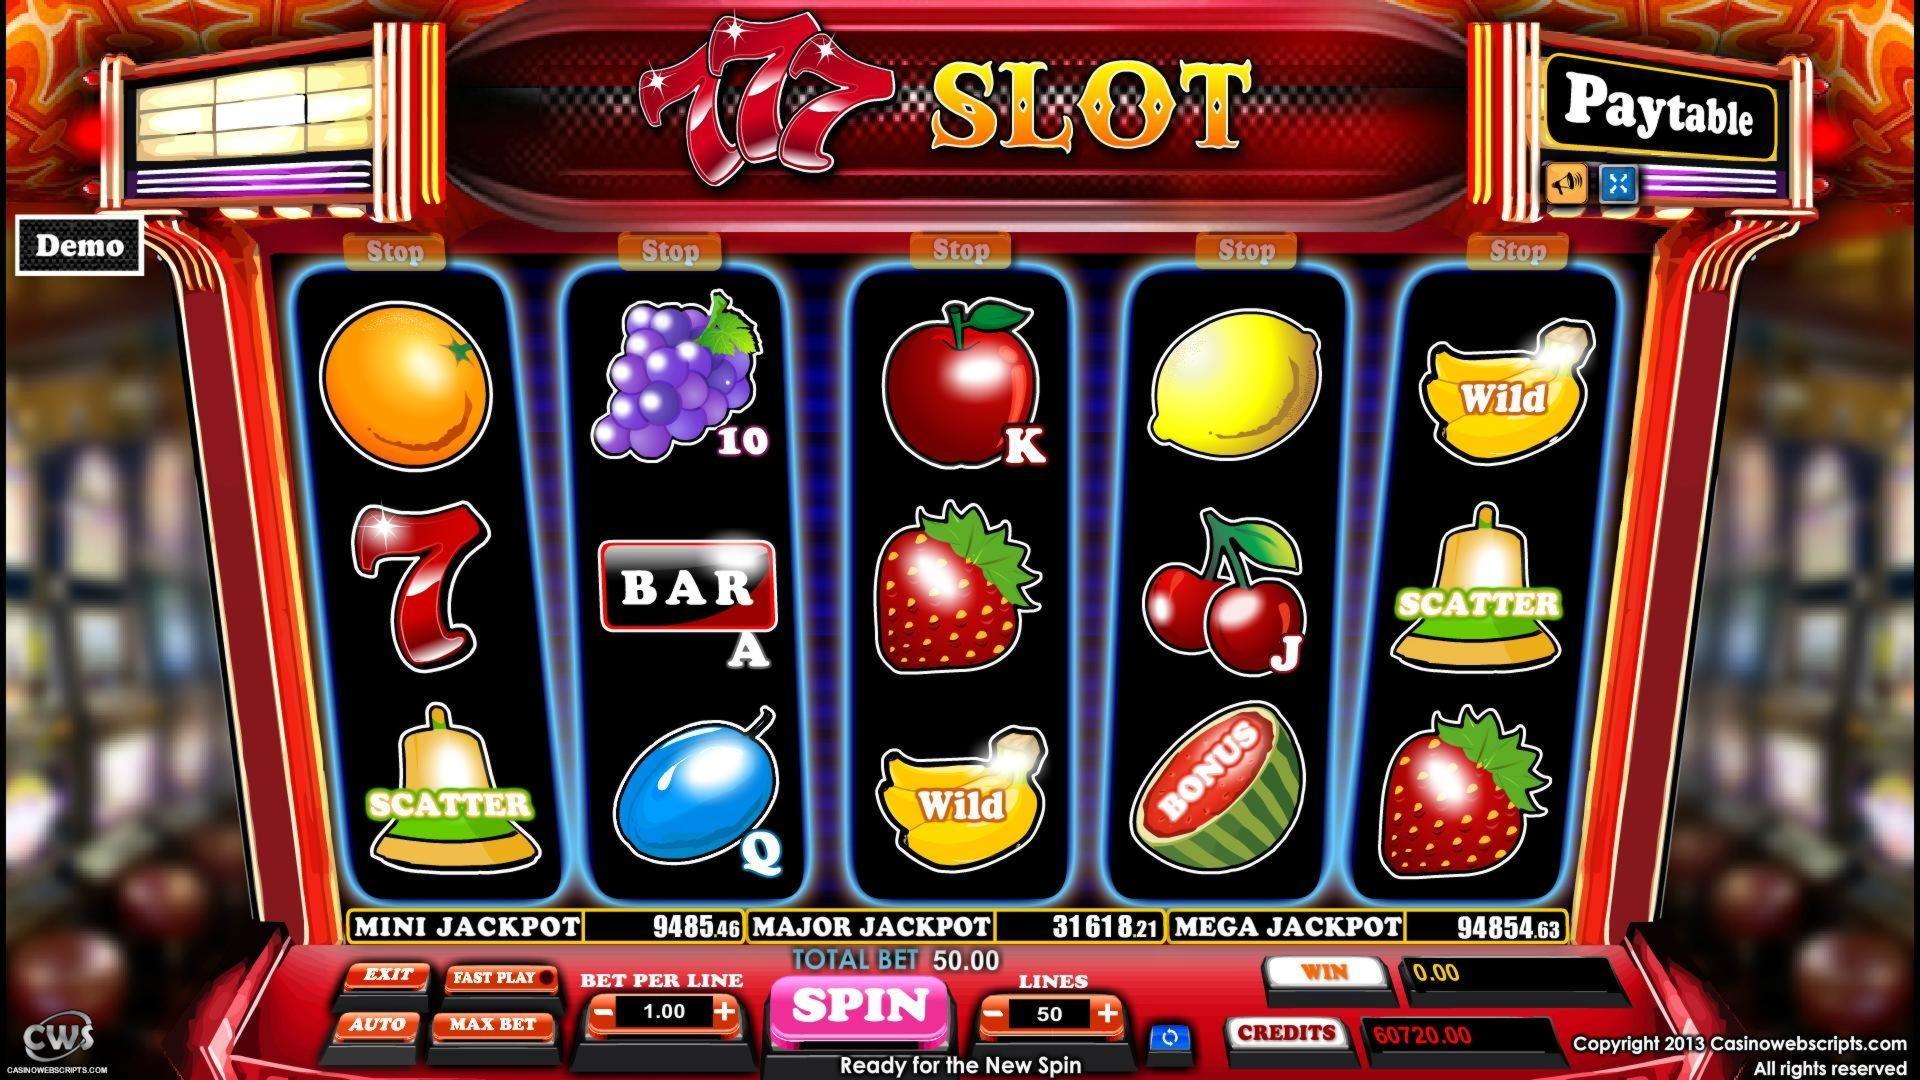 EURO 195 Ingyenes kaszinójegy a Joy Casino-ban